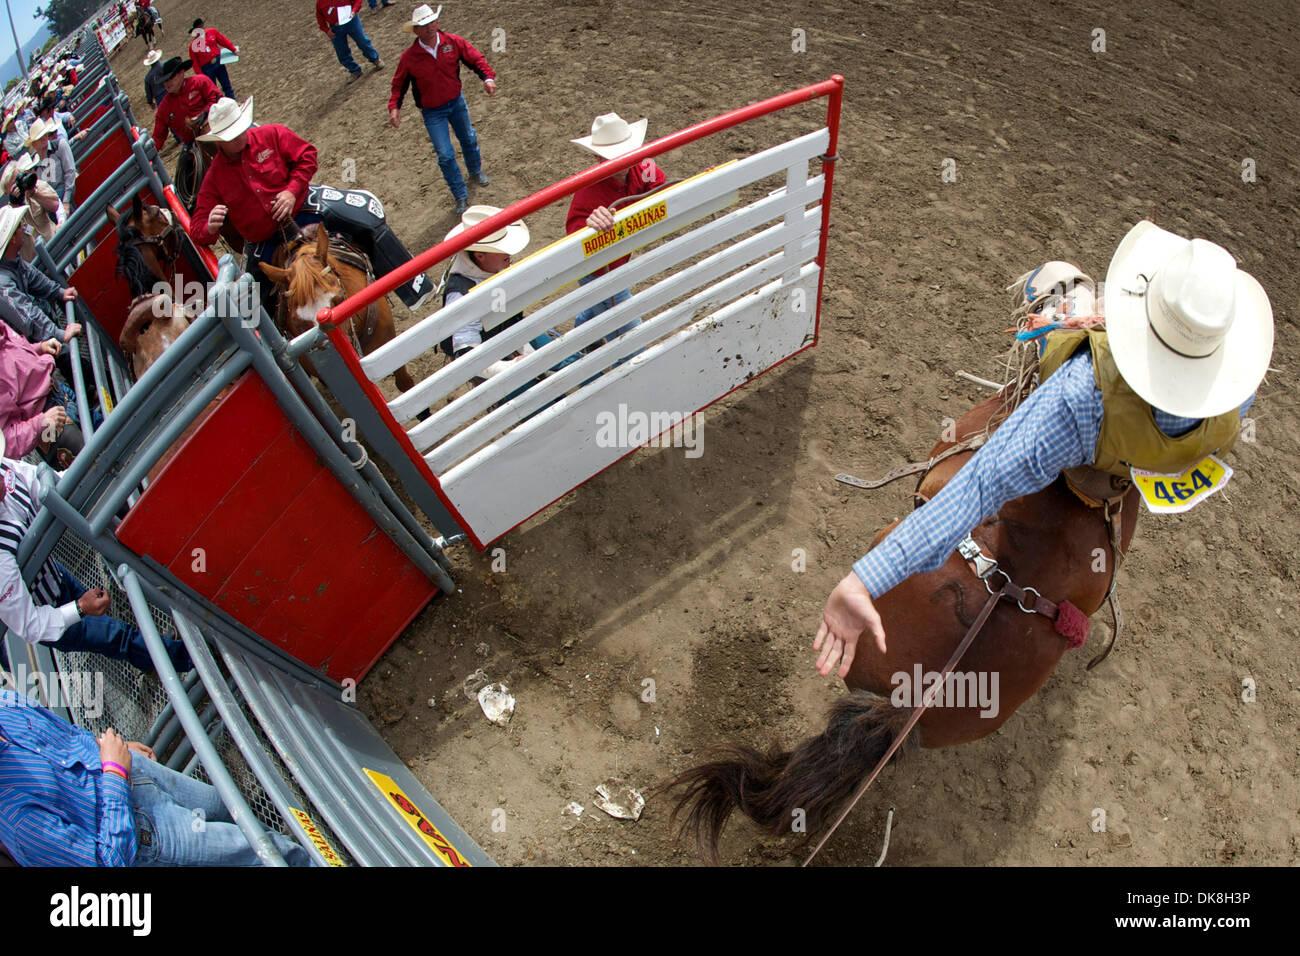 July 23, 2011 - Salinas, California, U.S - Saddle bronc rider Jeff Rianda of Tres Pinos, CA rides Smokin' Smurf at the California Rodeo Salinas in Salinas, CA. (Credit Image: © Matt Cohen/Southcreek Global/ZUMAPRESS.com) - Stock Image